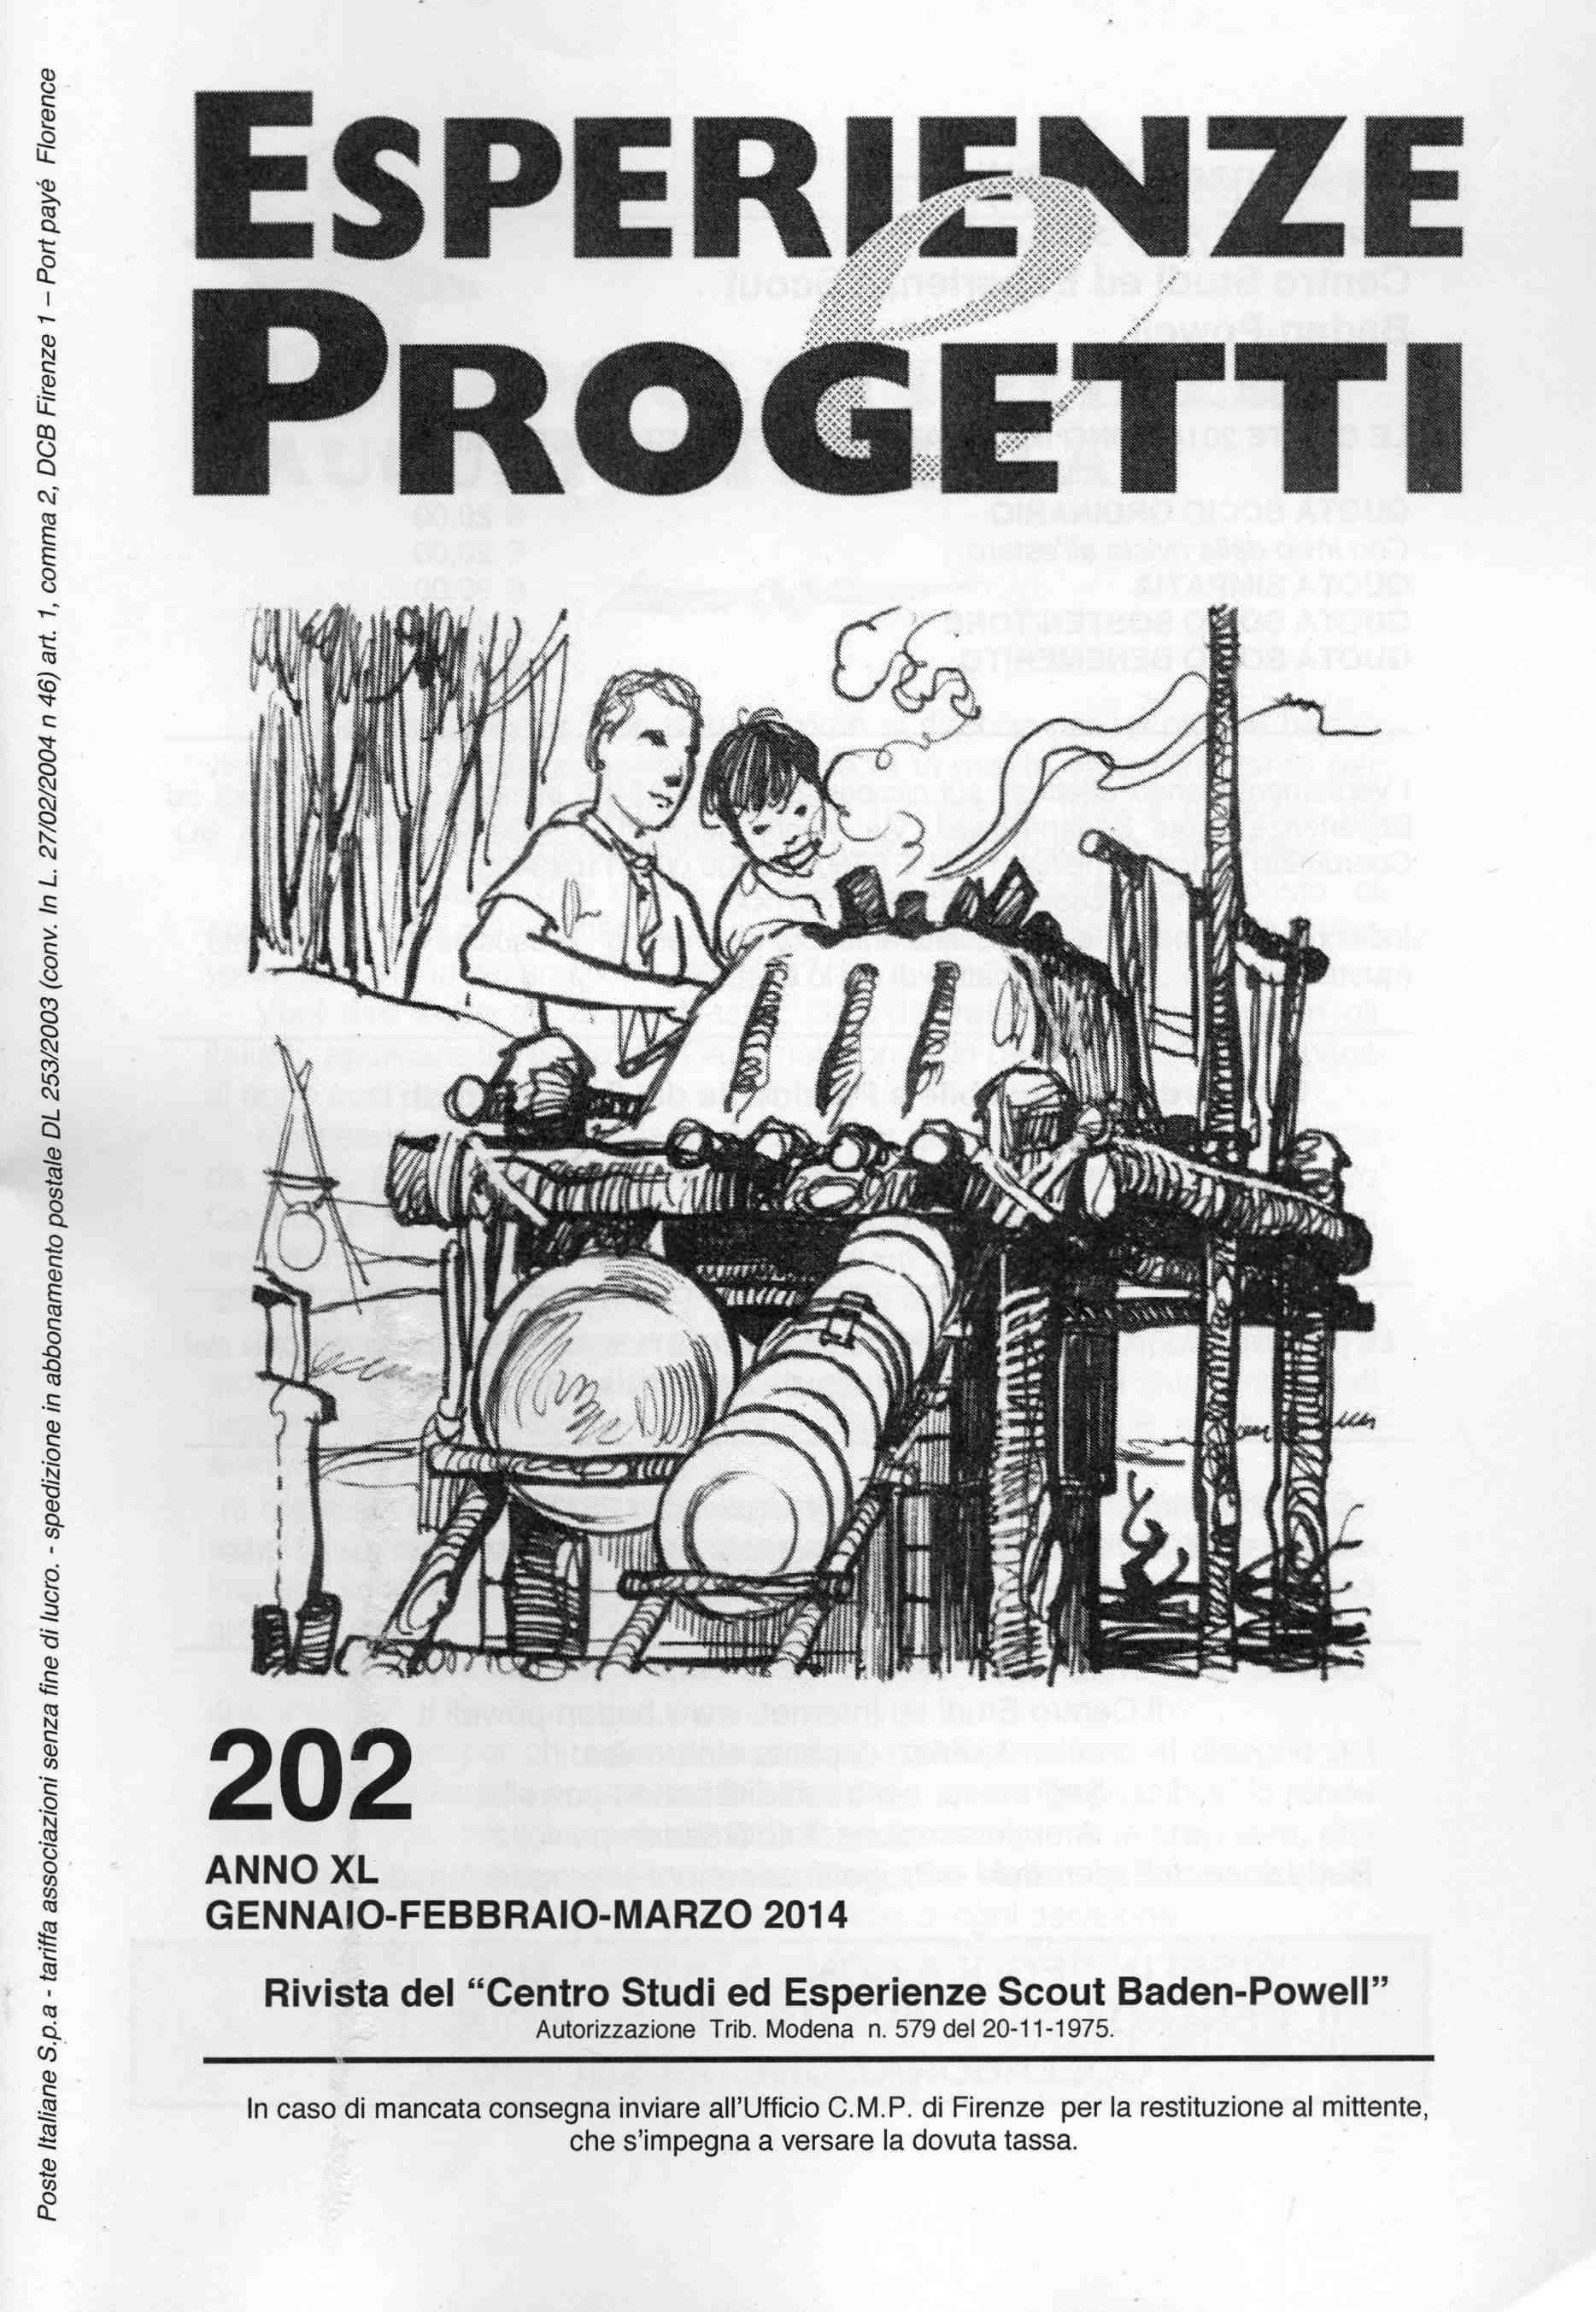 Esperienze & Progetti n. 202